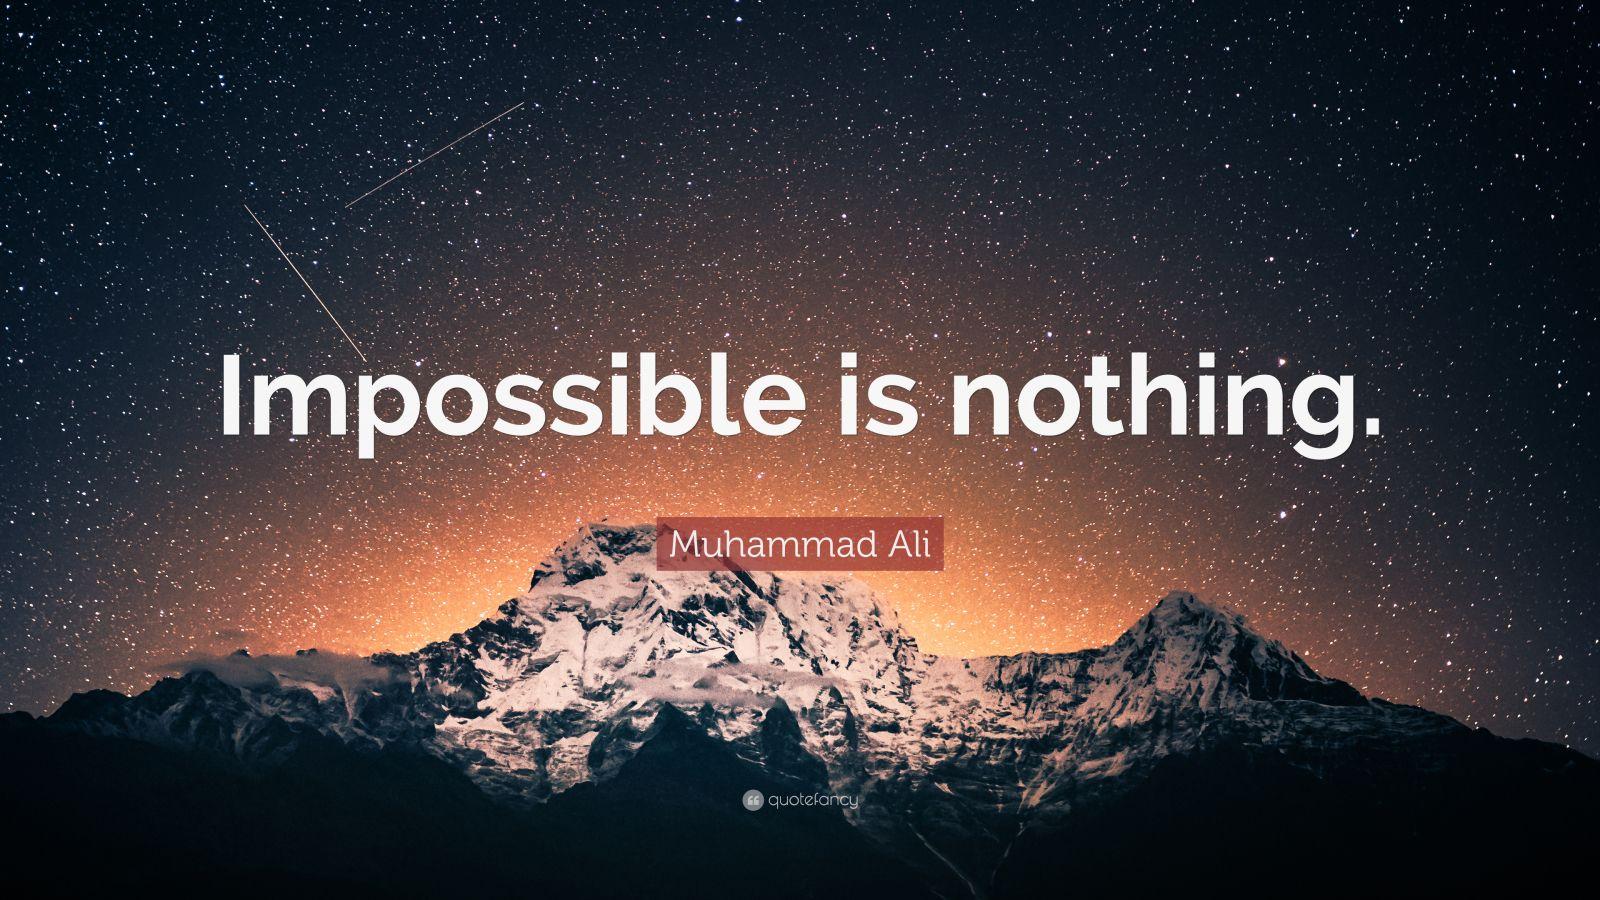 Mohamad Ali, Muhammad Ali Quotes ... - co.pinterest.com